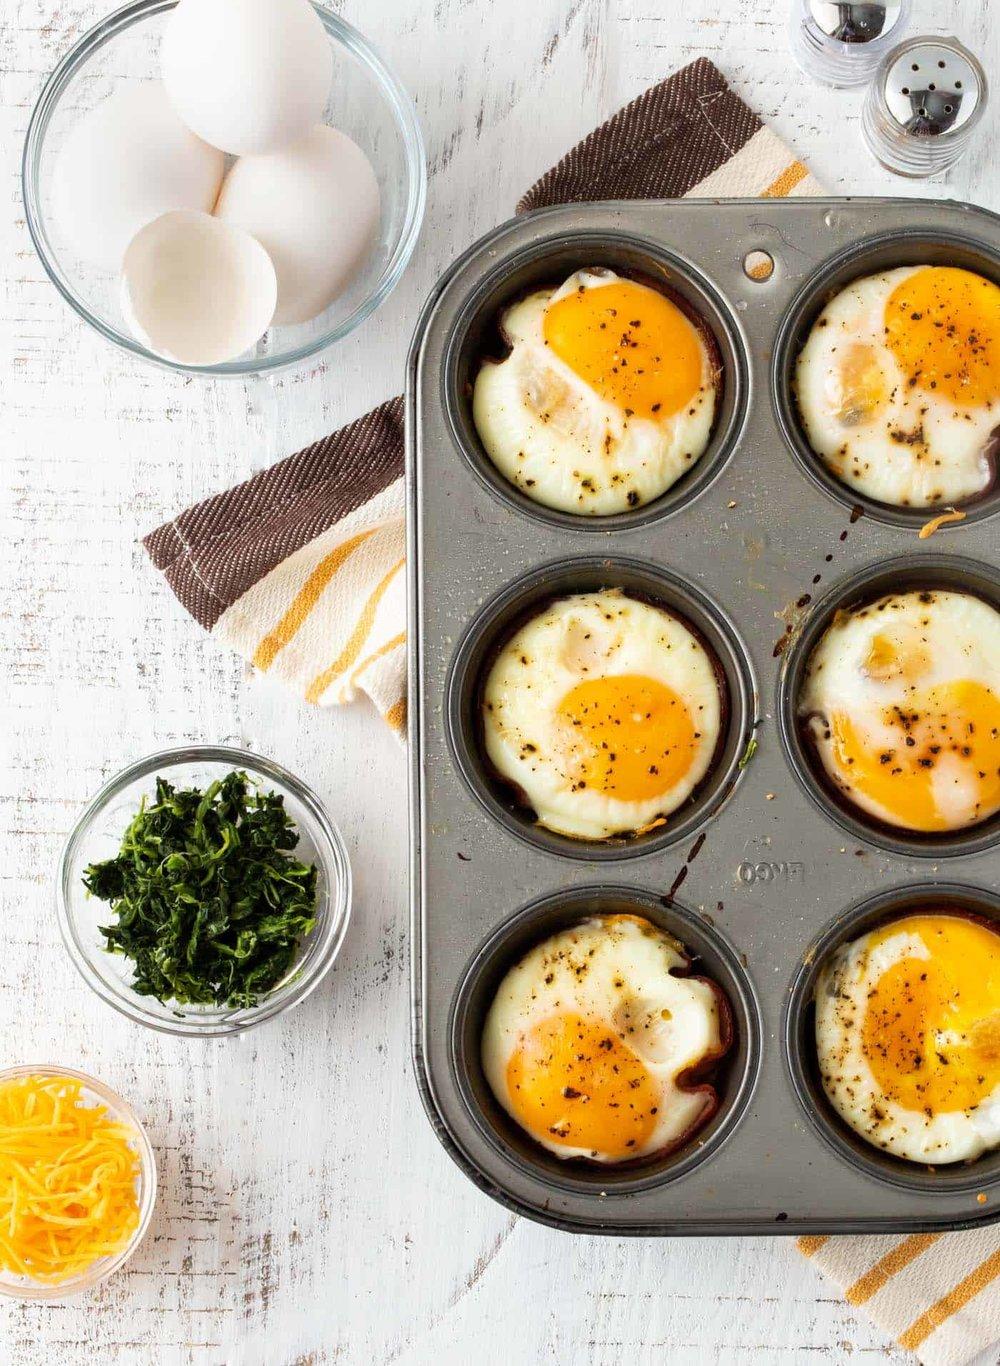 Summertime Snax - Veggie Egg Cups